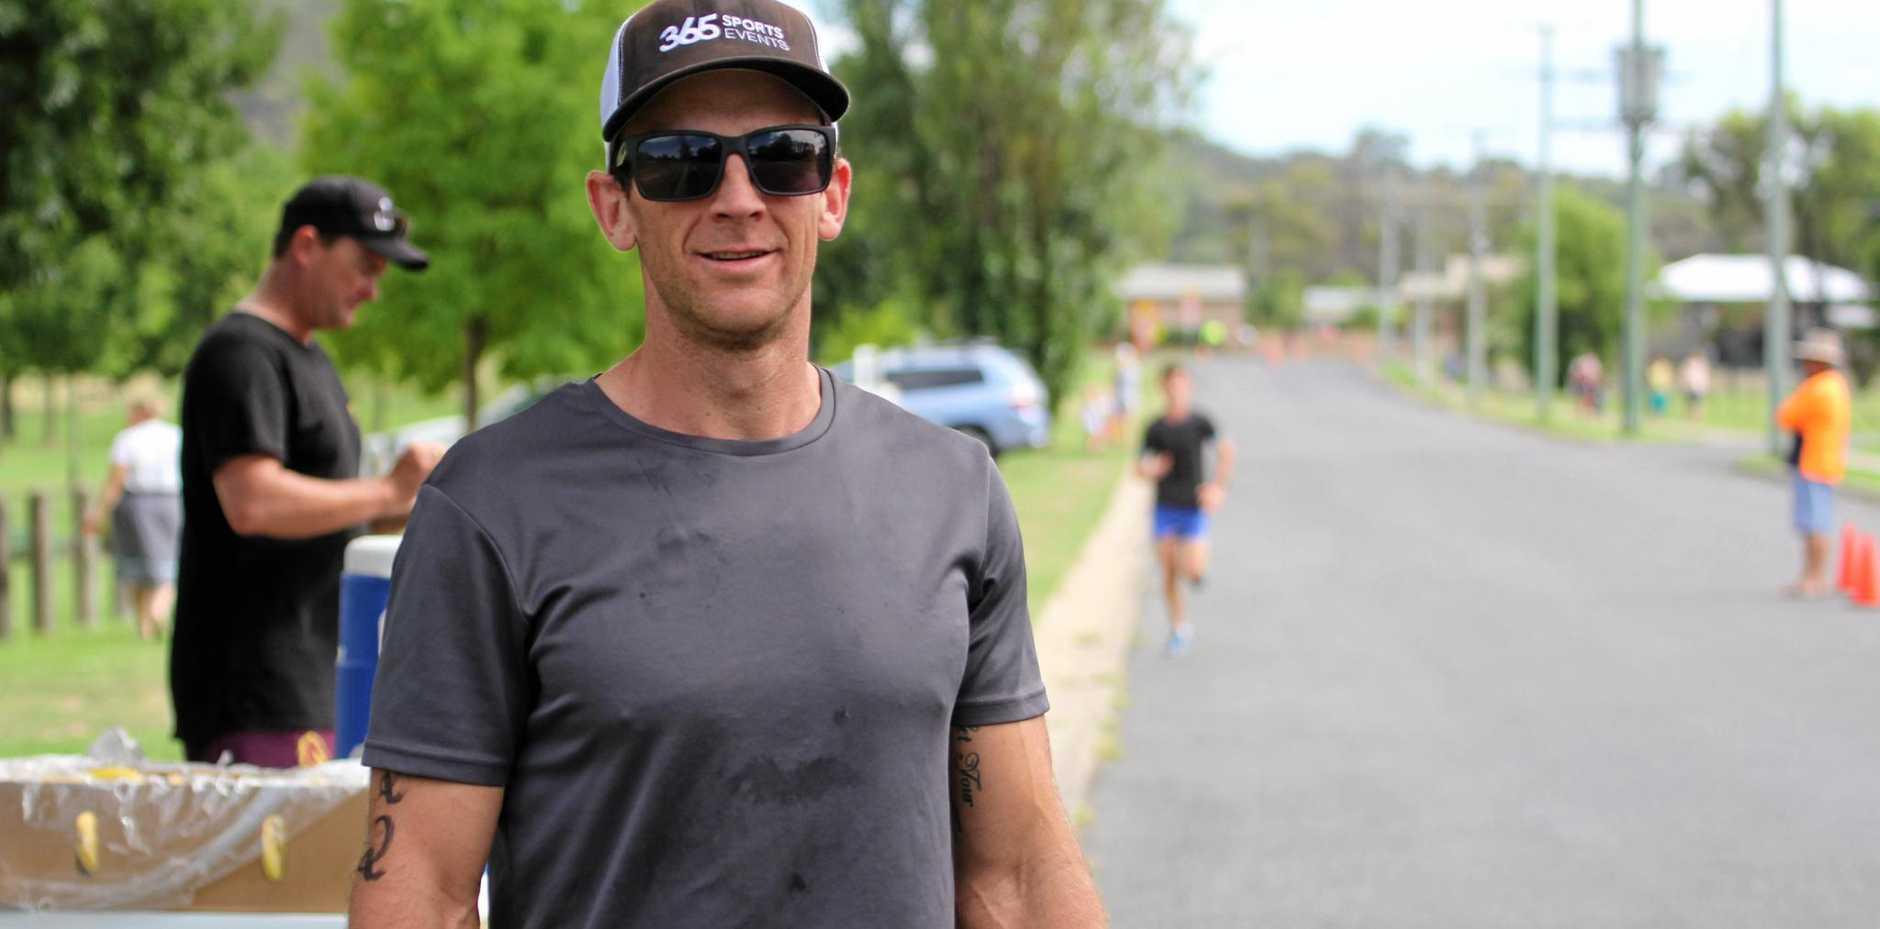 Adrian Jannenga claimed Stanthorpe's Australia Day Sports Award for 2017.